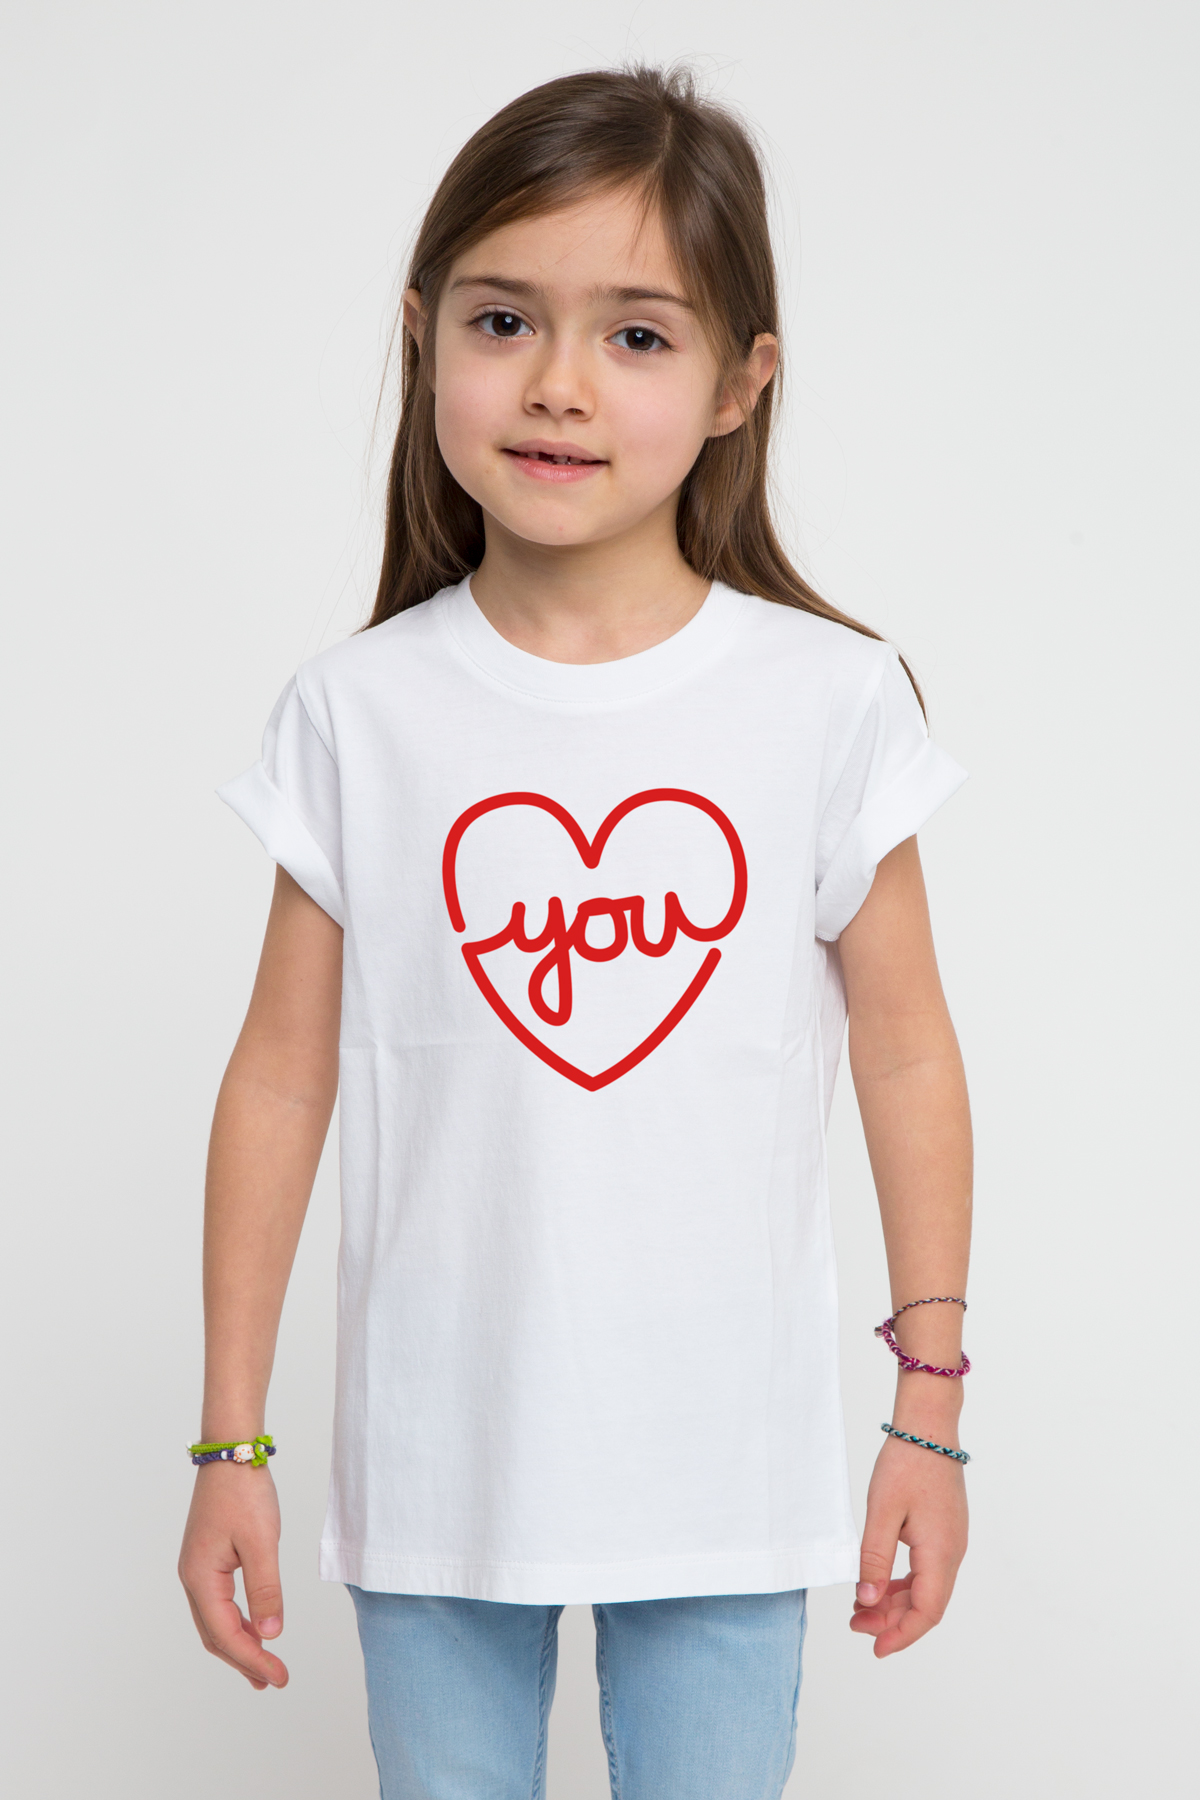 Tshirt LOVE YOU French Disorder